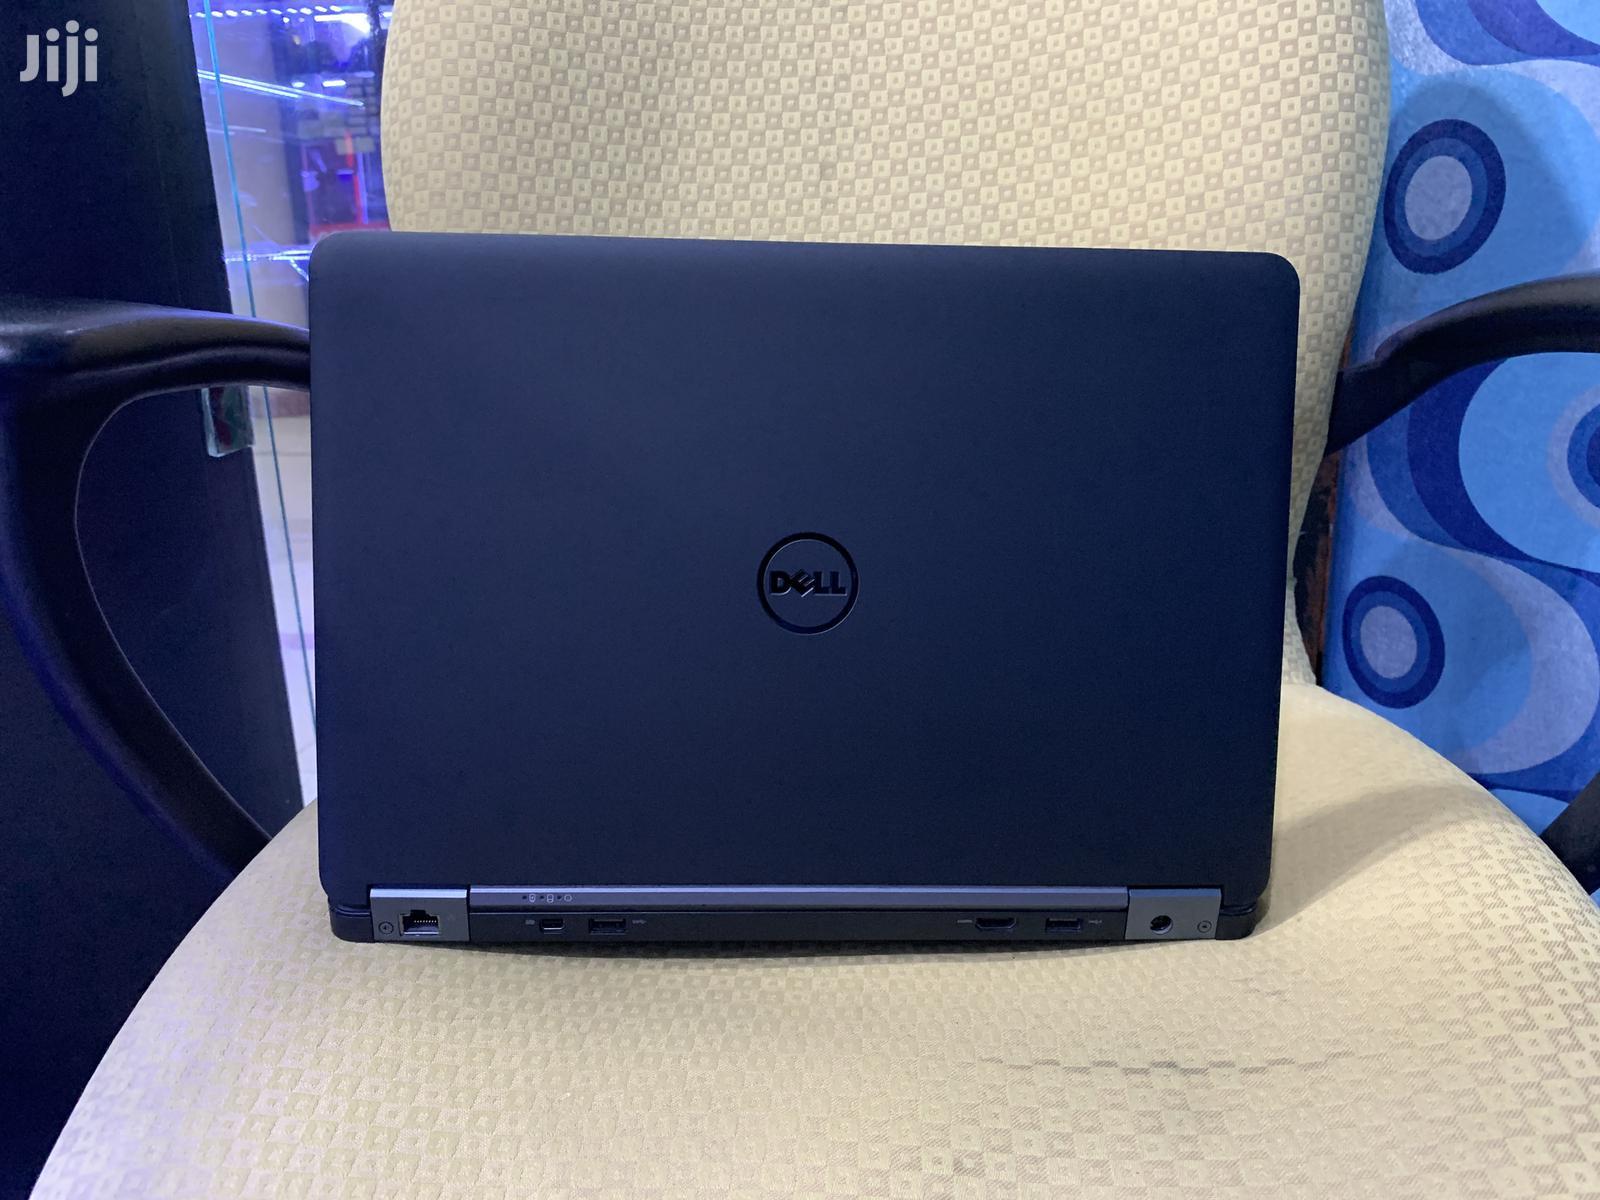 Laptop Dell Latitude E7450 4GB Intel Core i7 HDD 500GB | Laptops & Computers for sale in Kampala, Central Region, Uganda